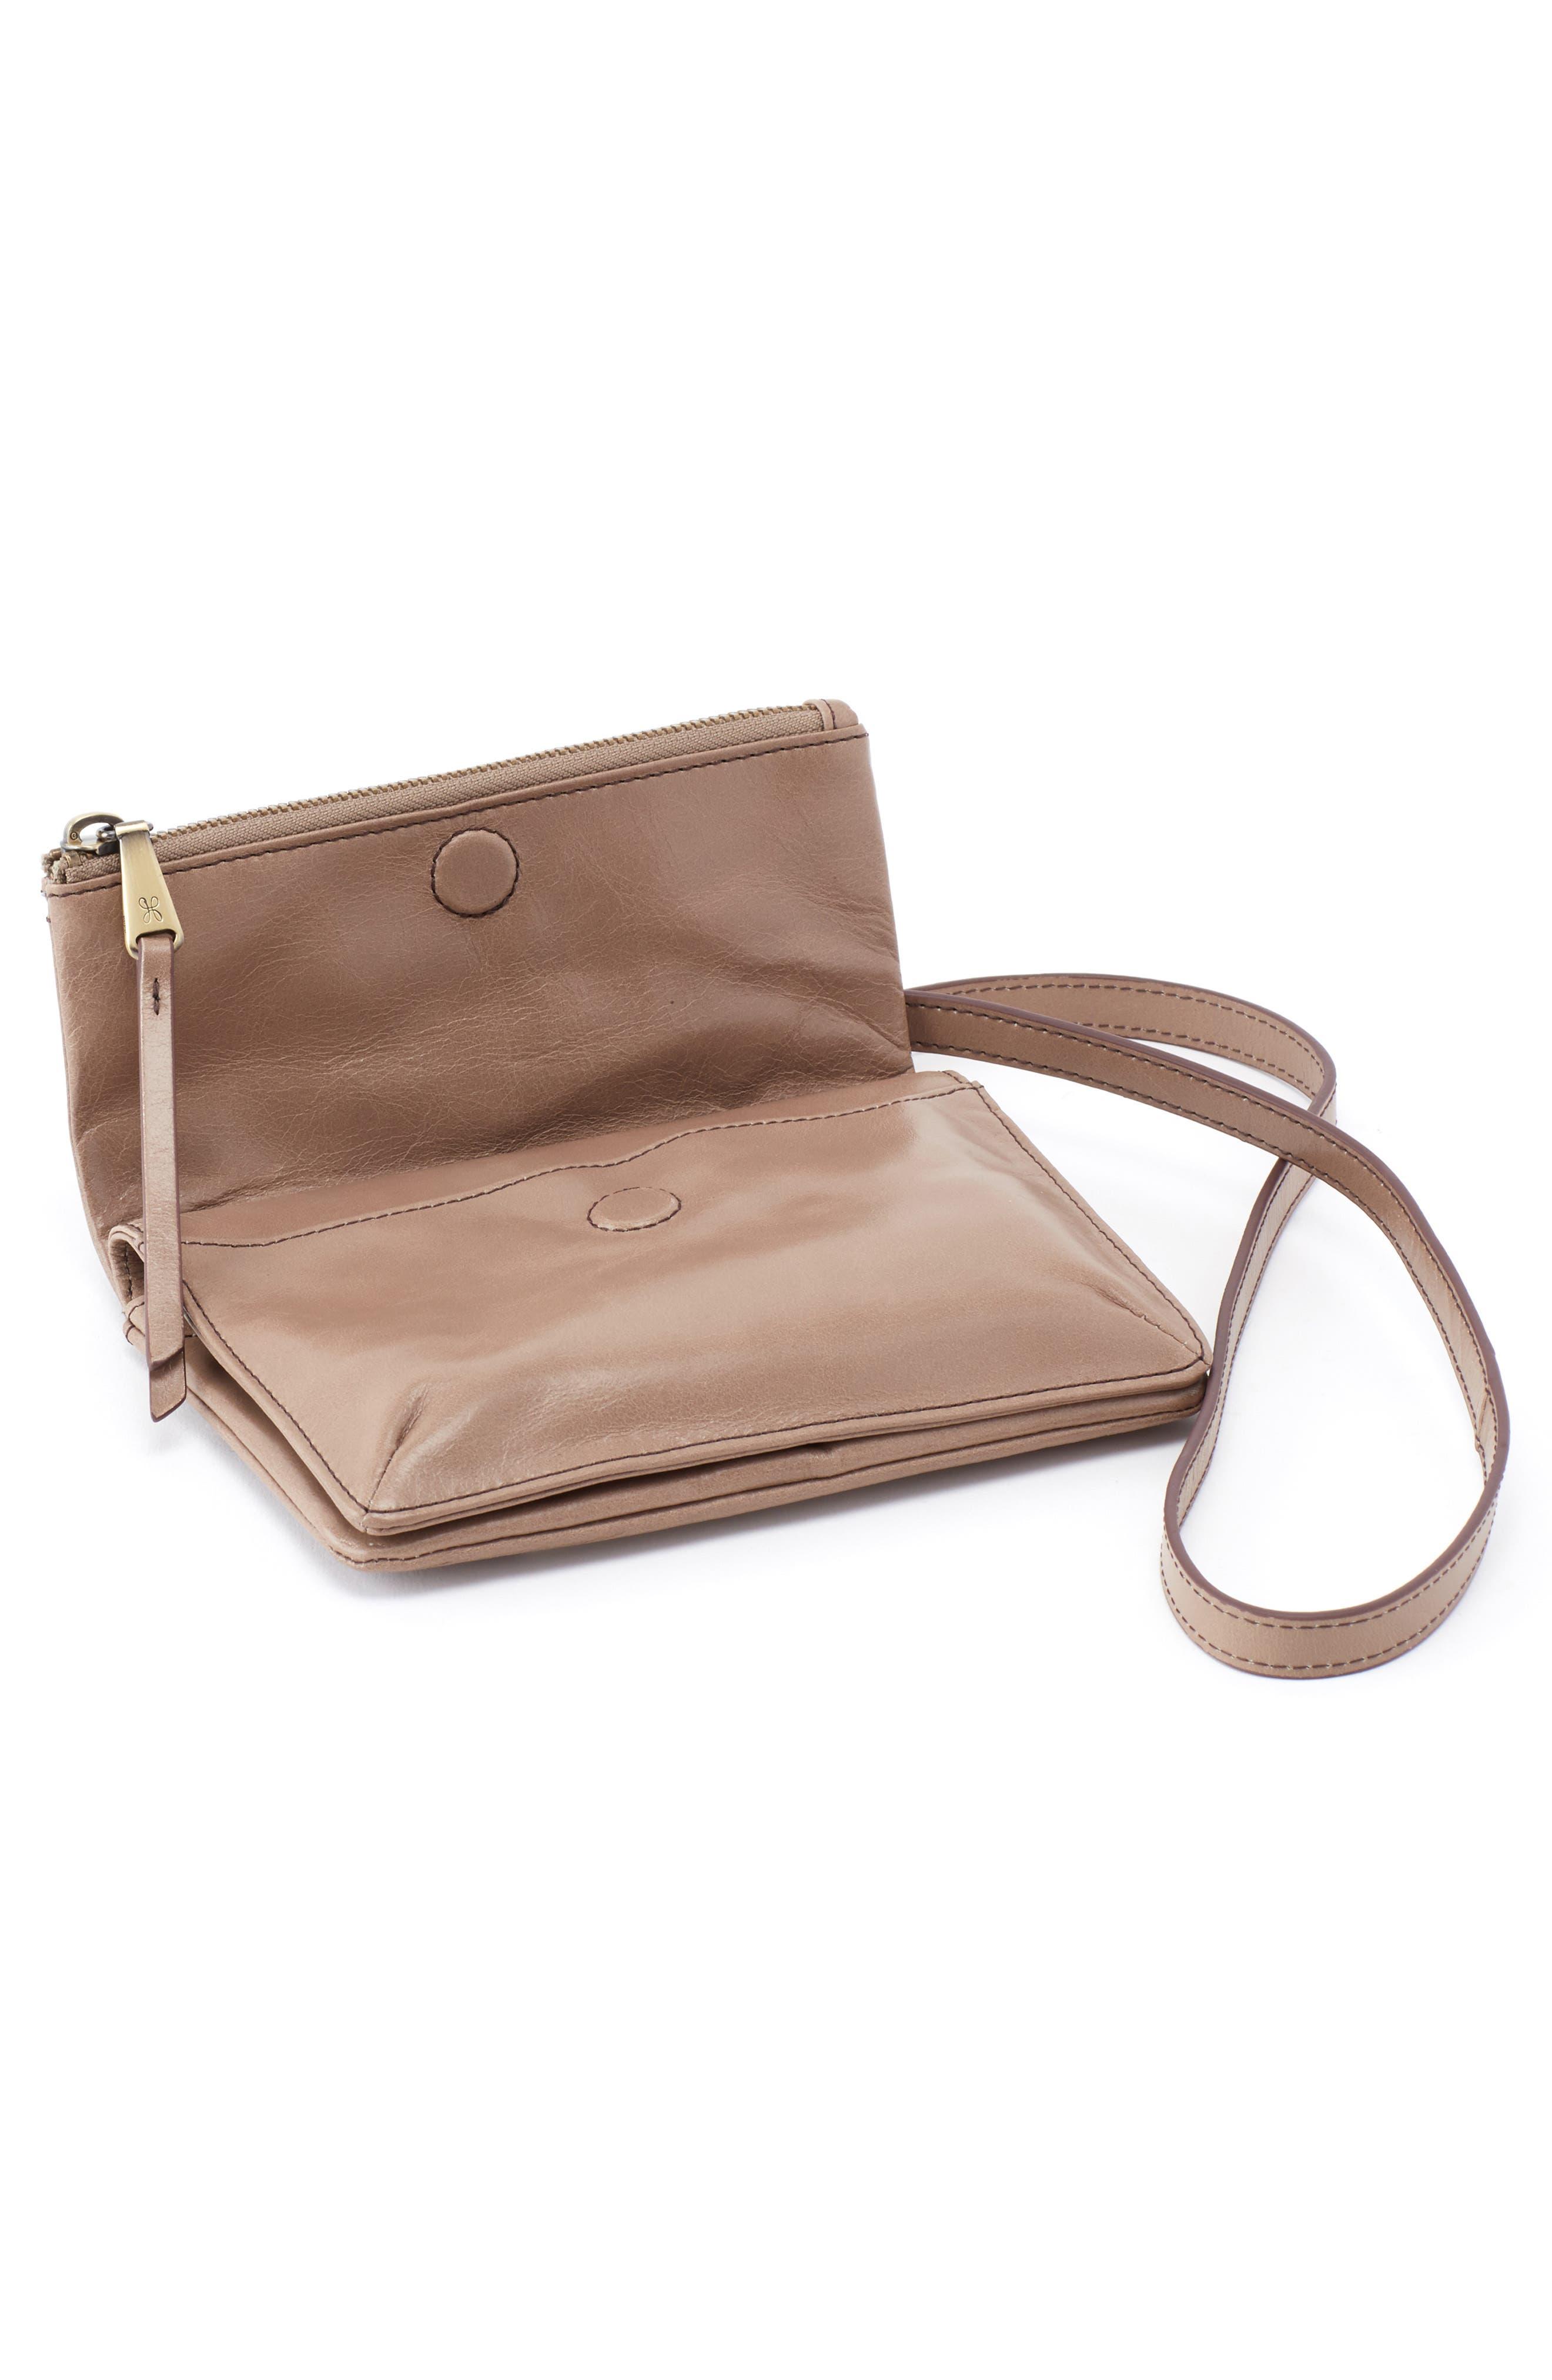 Glade Leather Crossbody Bag,                             Alternate thumbnail 4, color,                             COBBLESTONE